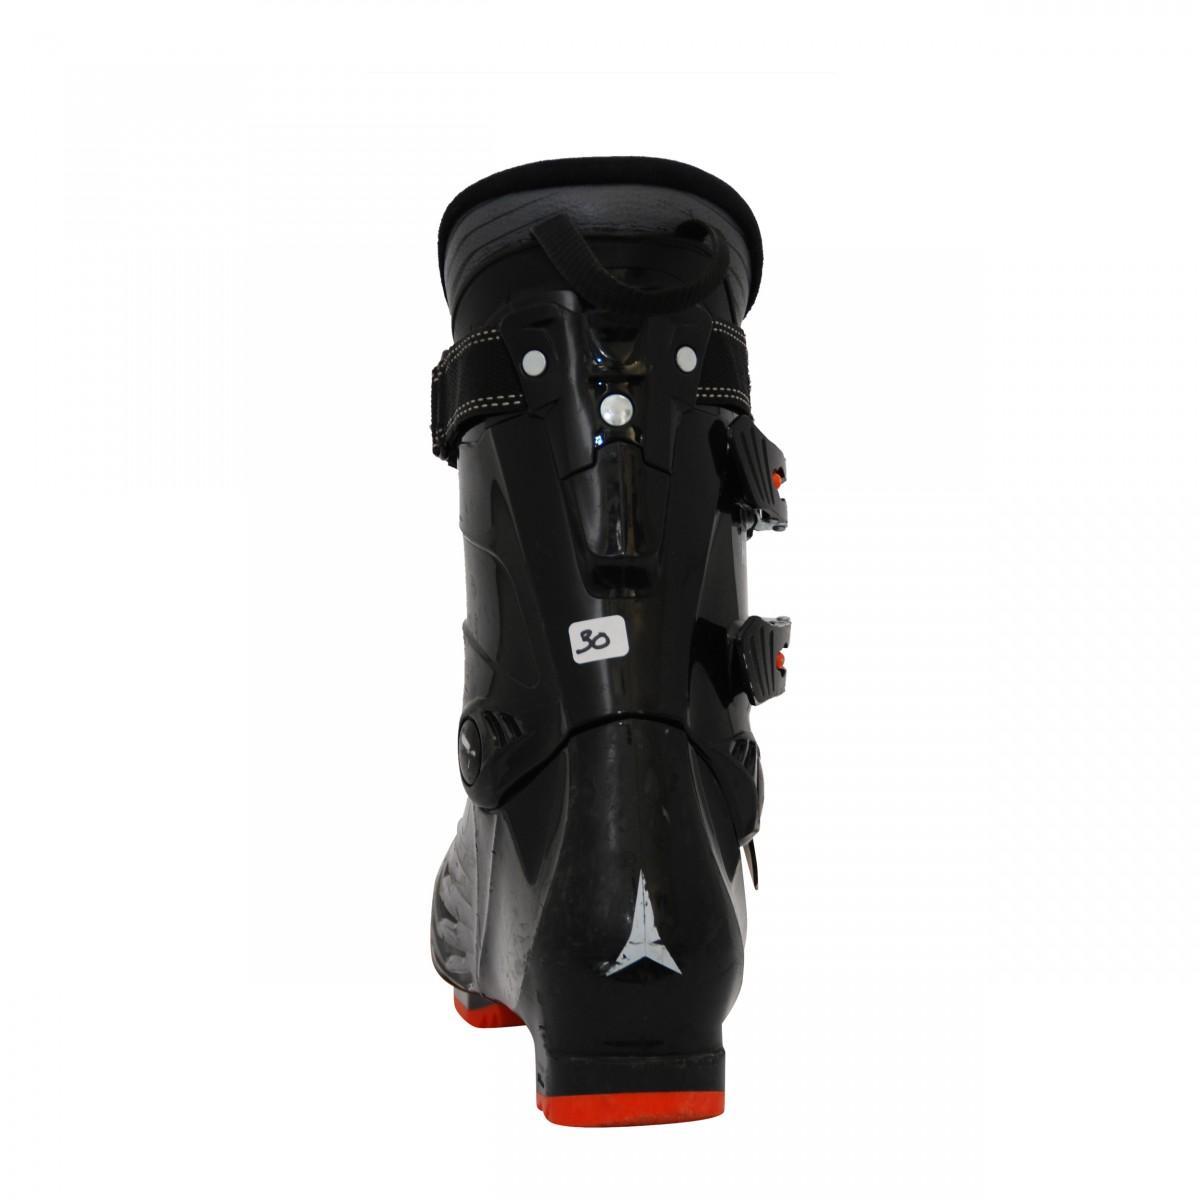 Chaussure-Ski-Occasion-Atomic-Hawx-plus-noir-orange miniature 3